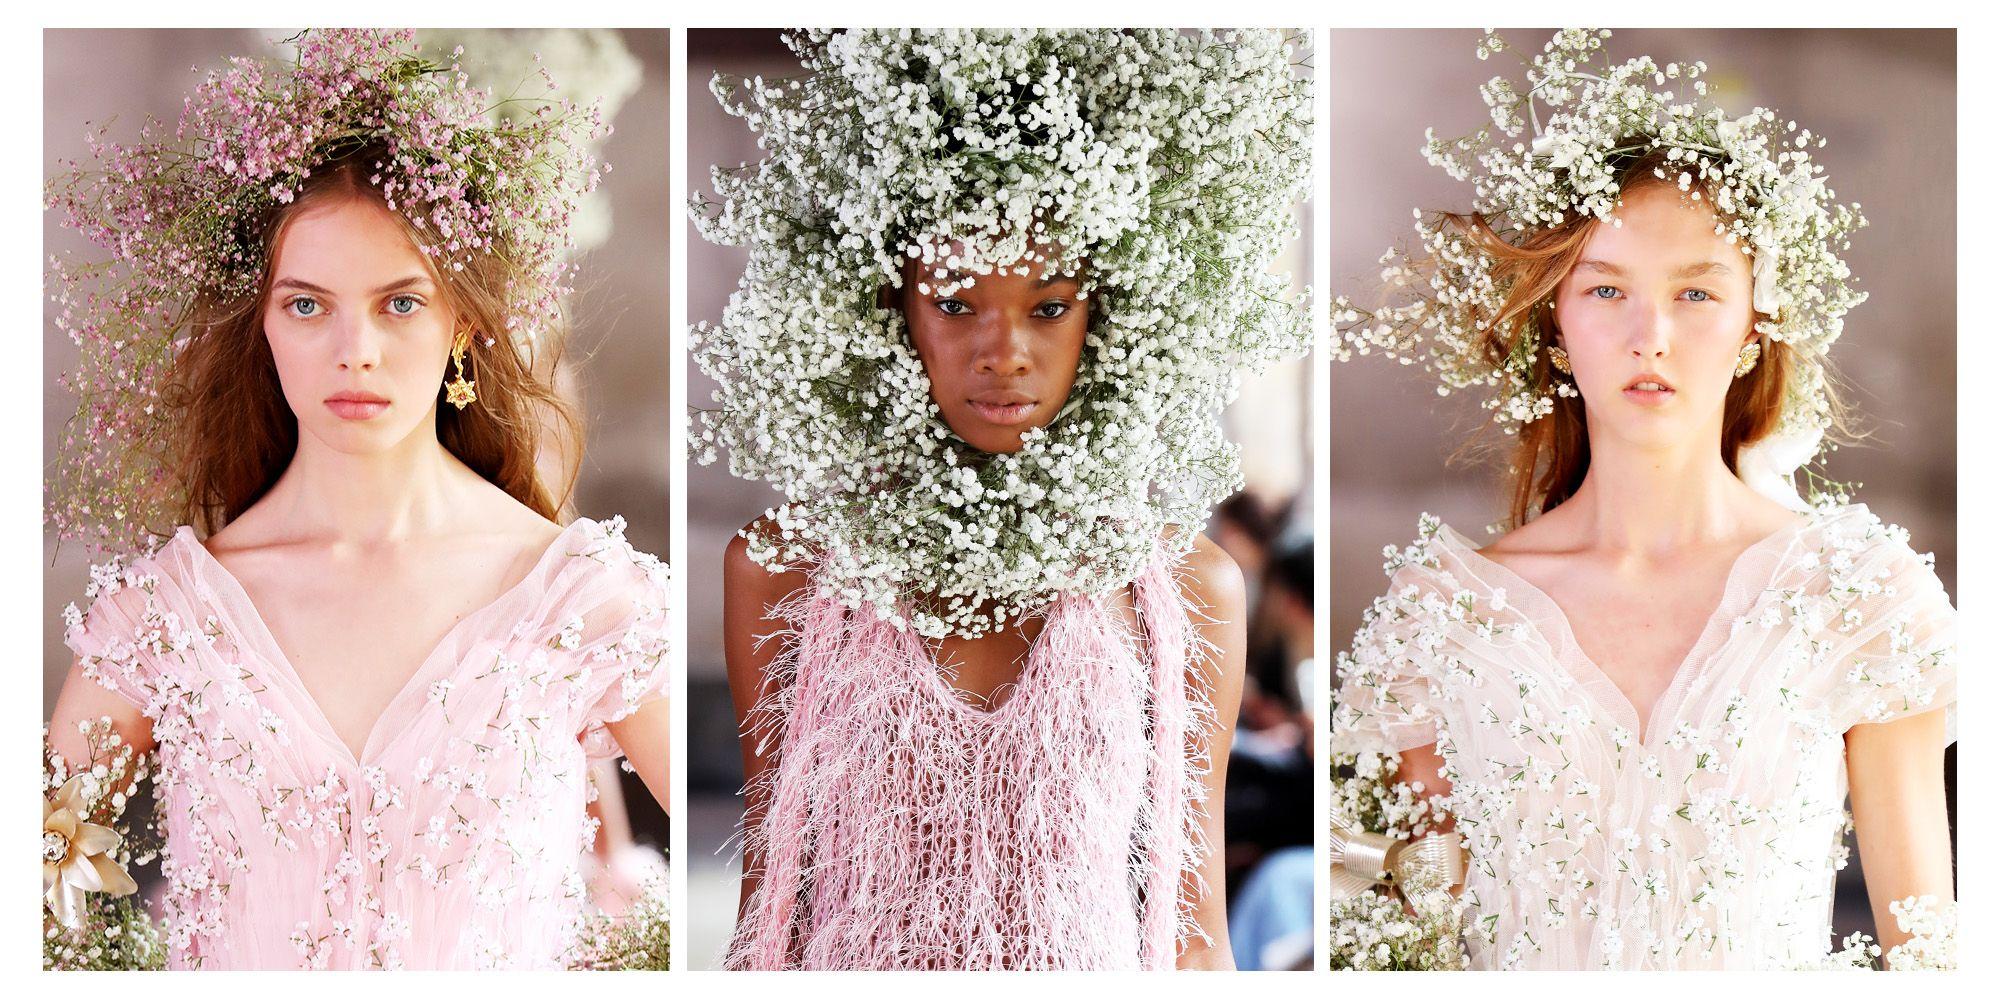 Rodartes spring 2018 collection takes flower crowns to the next level izmirmasajfo